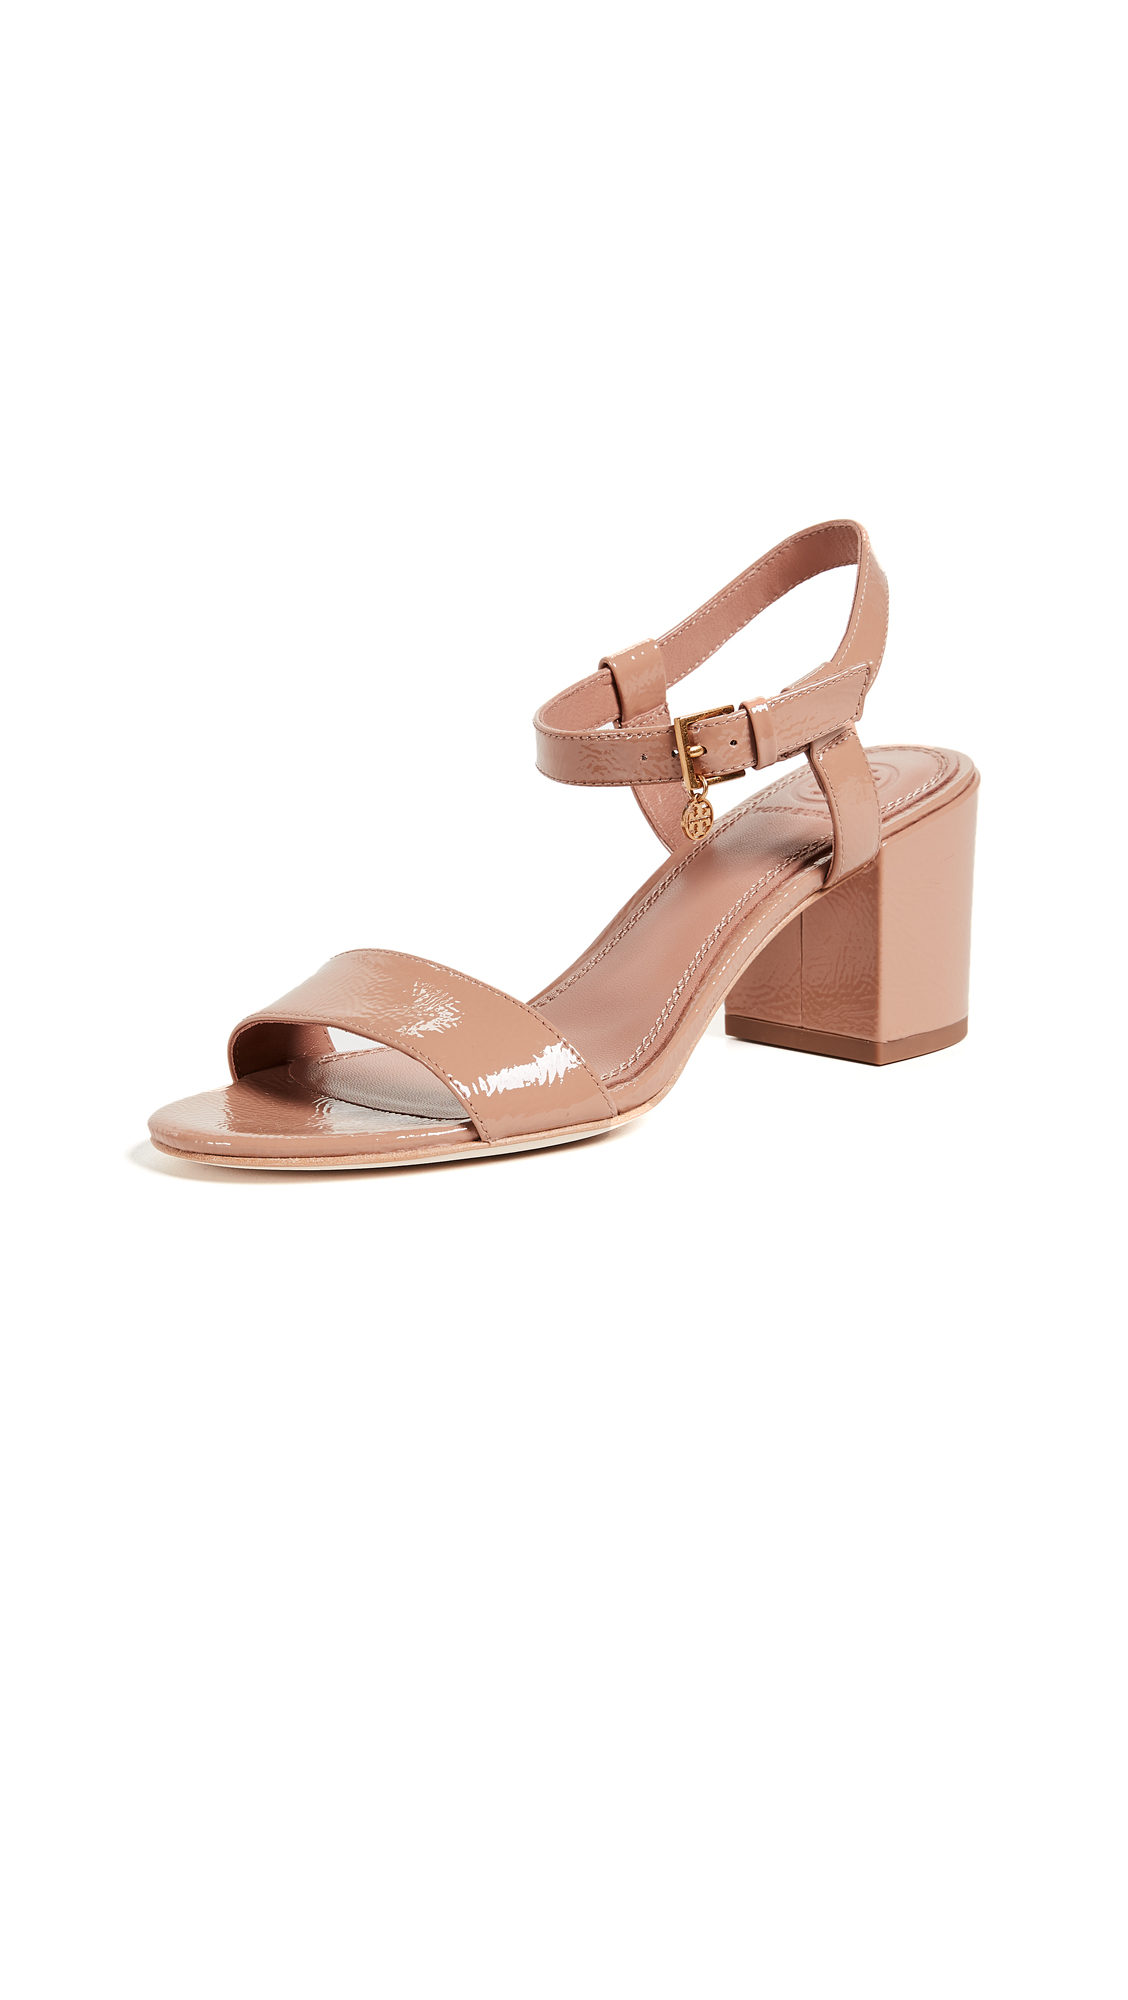 Tory Burch Laurel 65mm Ankle Strap Sandals - Makeup